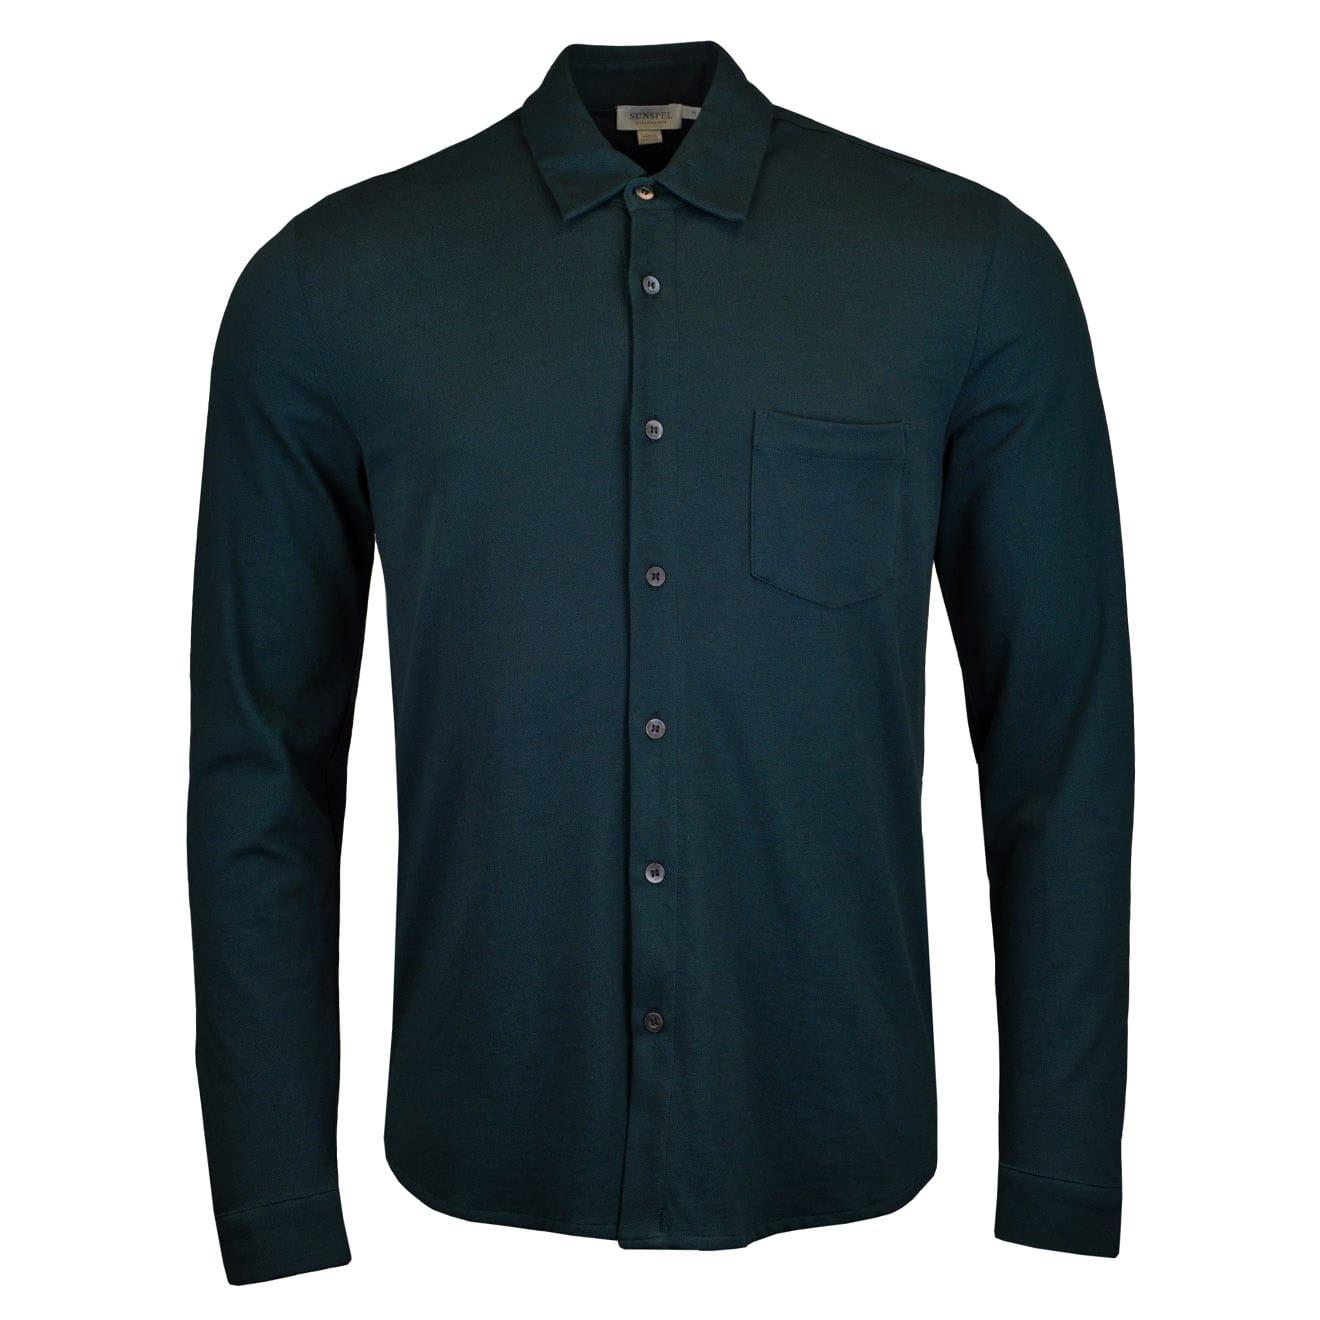 Sunspel Pique Polo Shirt Samphire